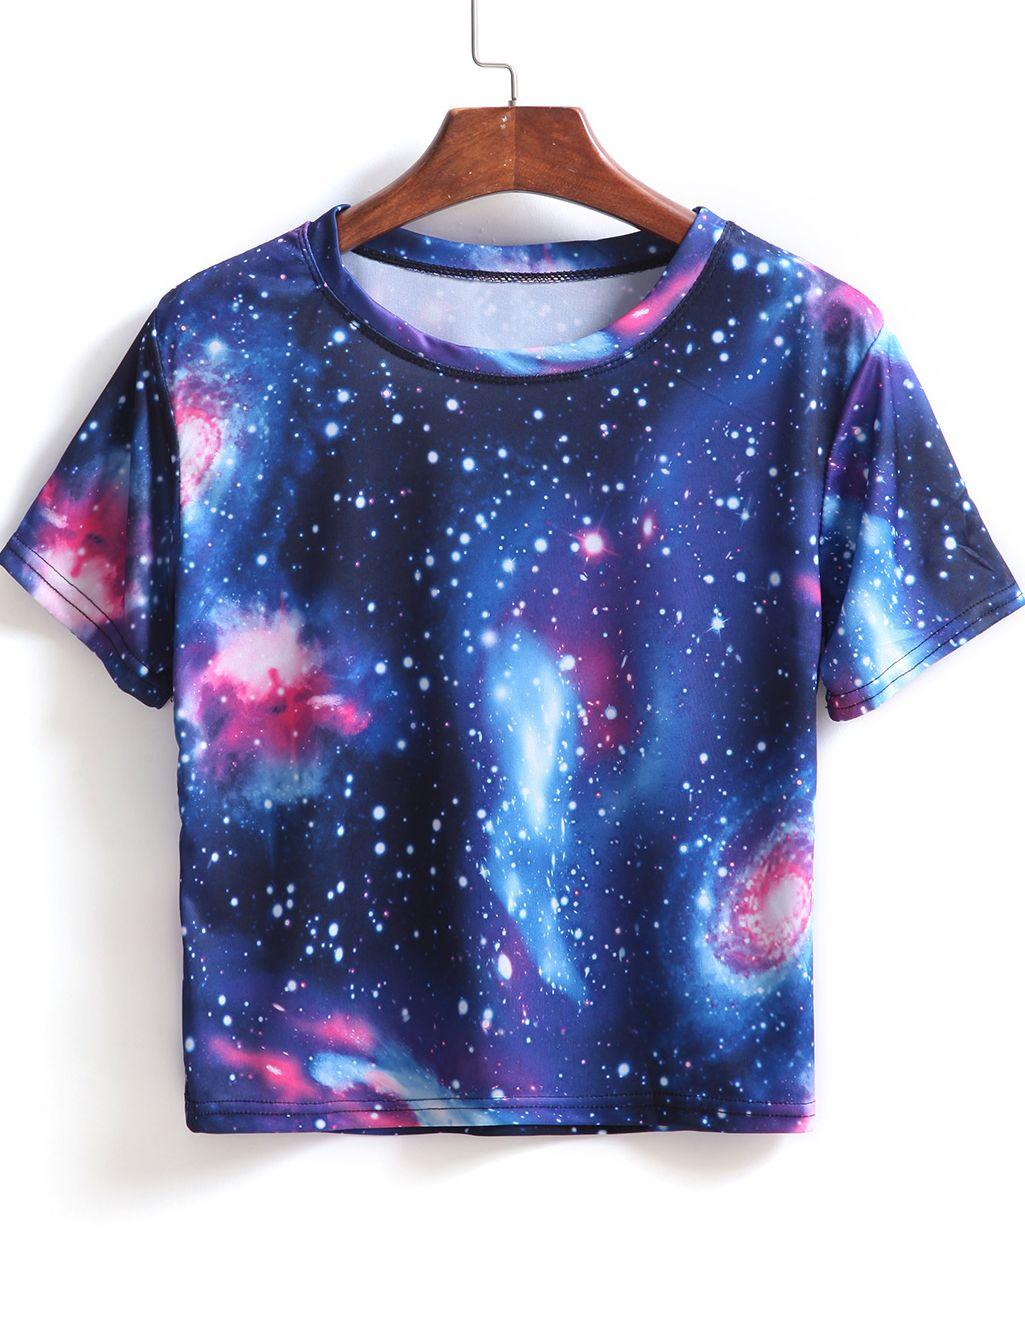 1d69c4a8 Camiseta Crop galaxia manga corta-azul 7.35 | Cosas para comprar en ...